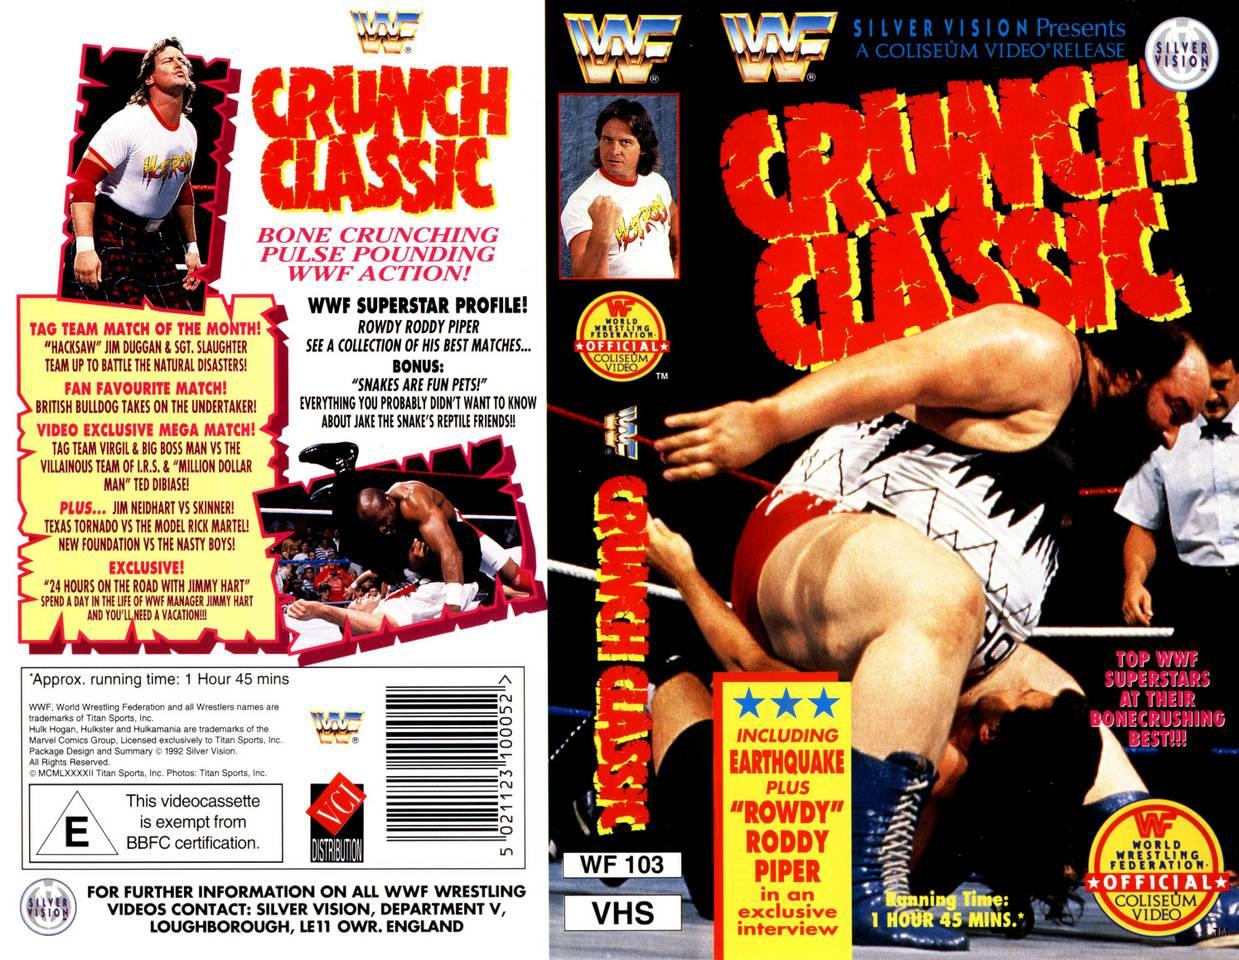 crunchclassic8cn